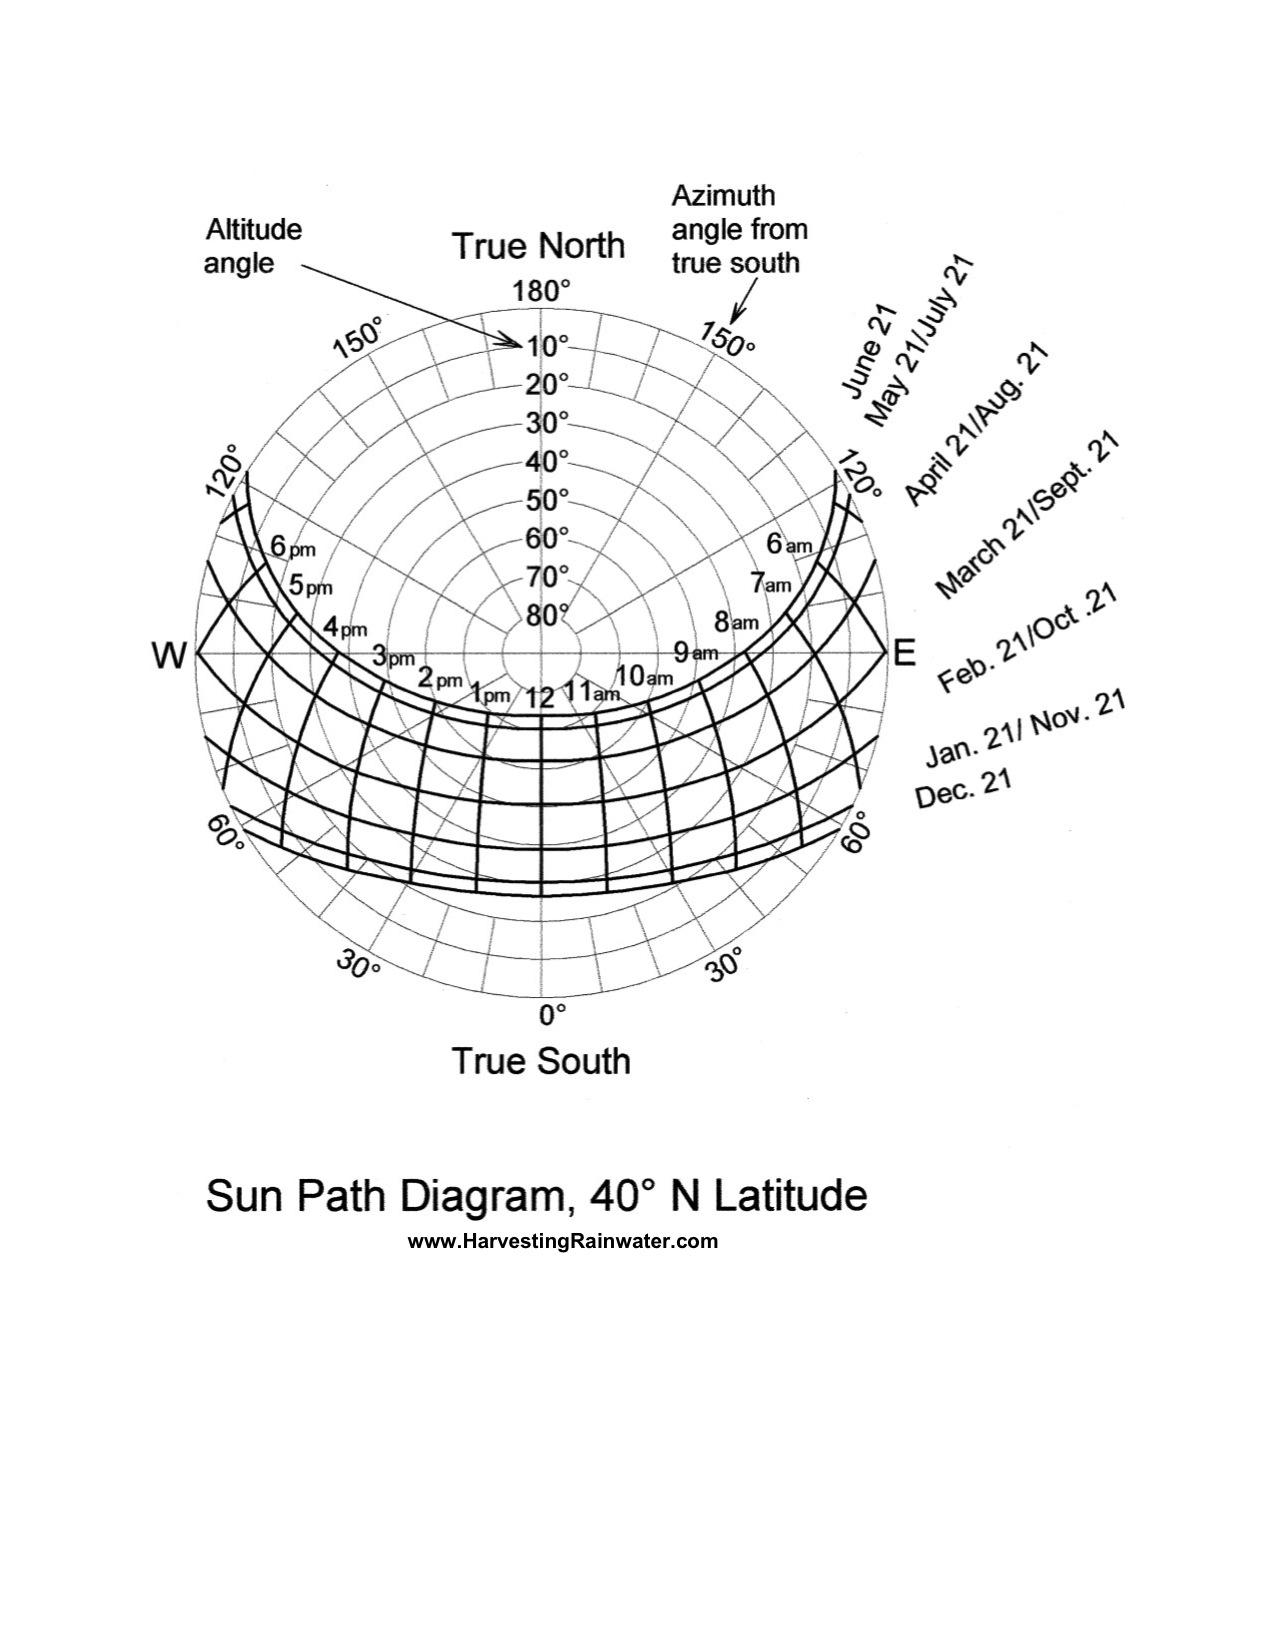 Sun Path Diagram 40o N Latitude